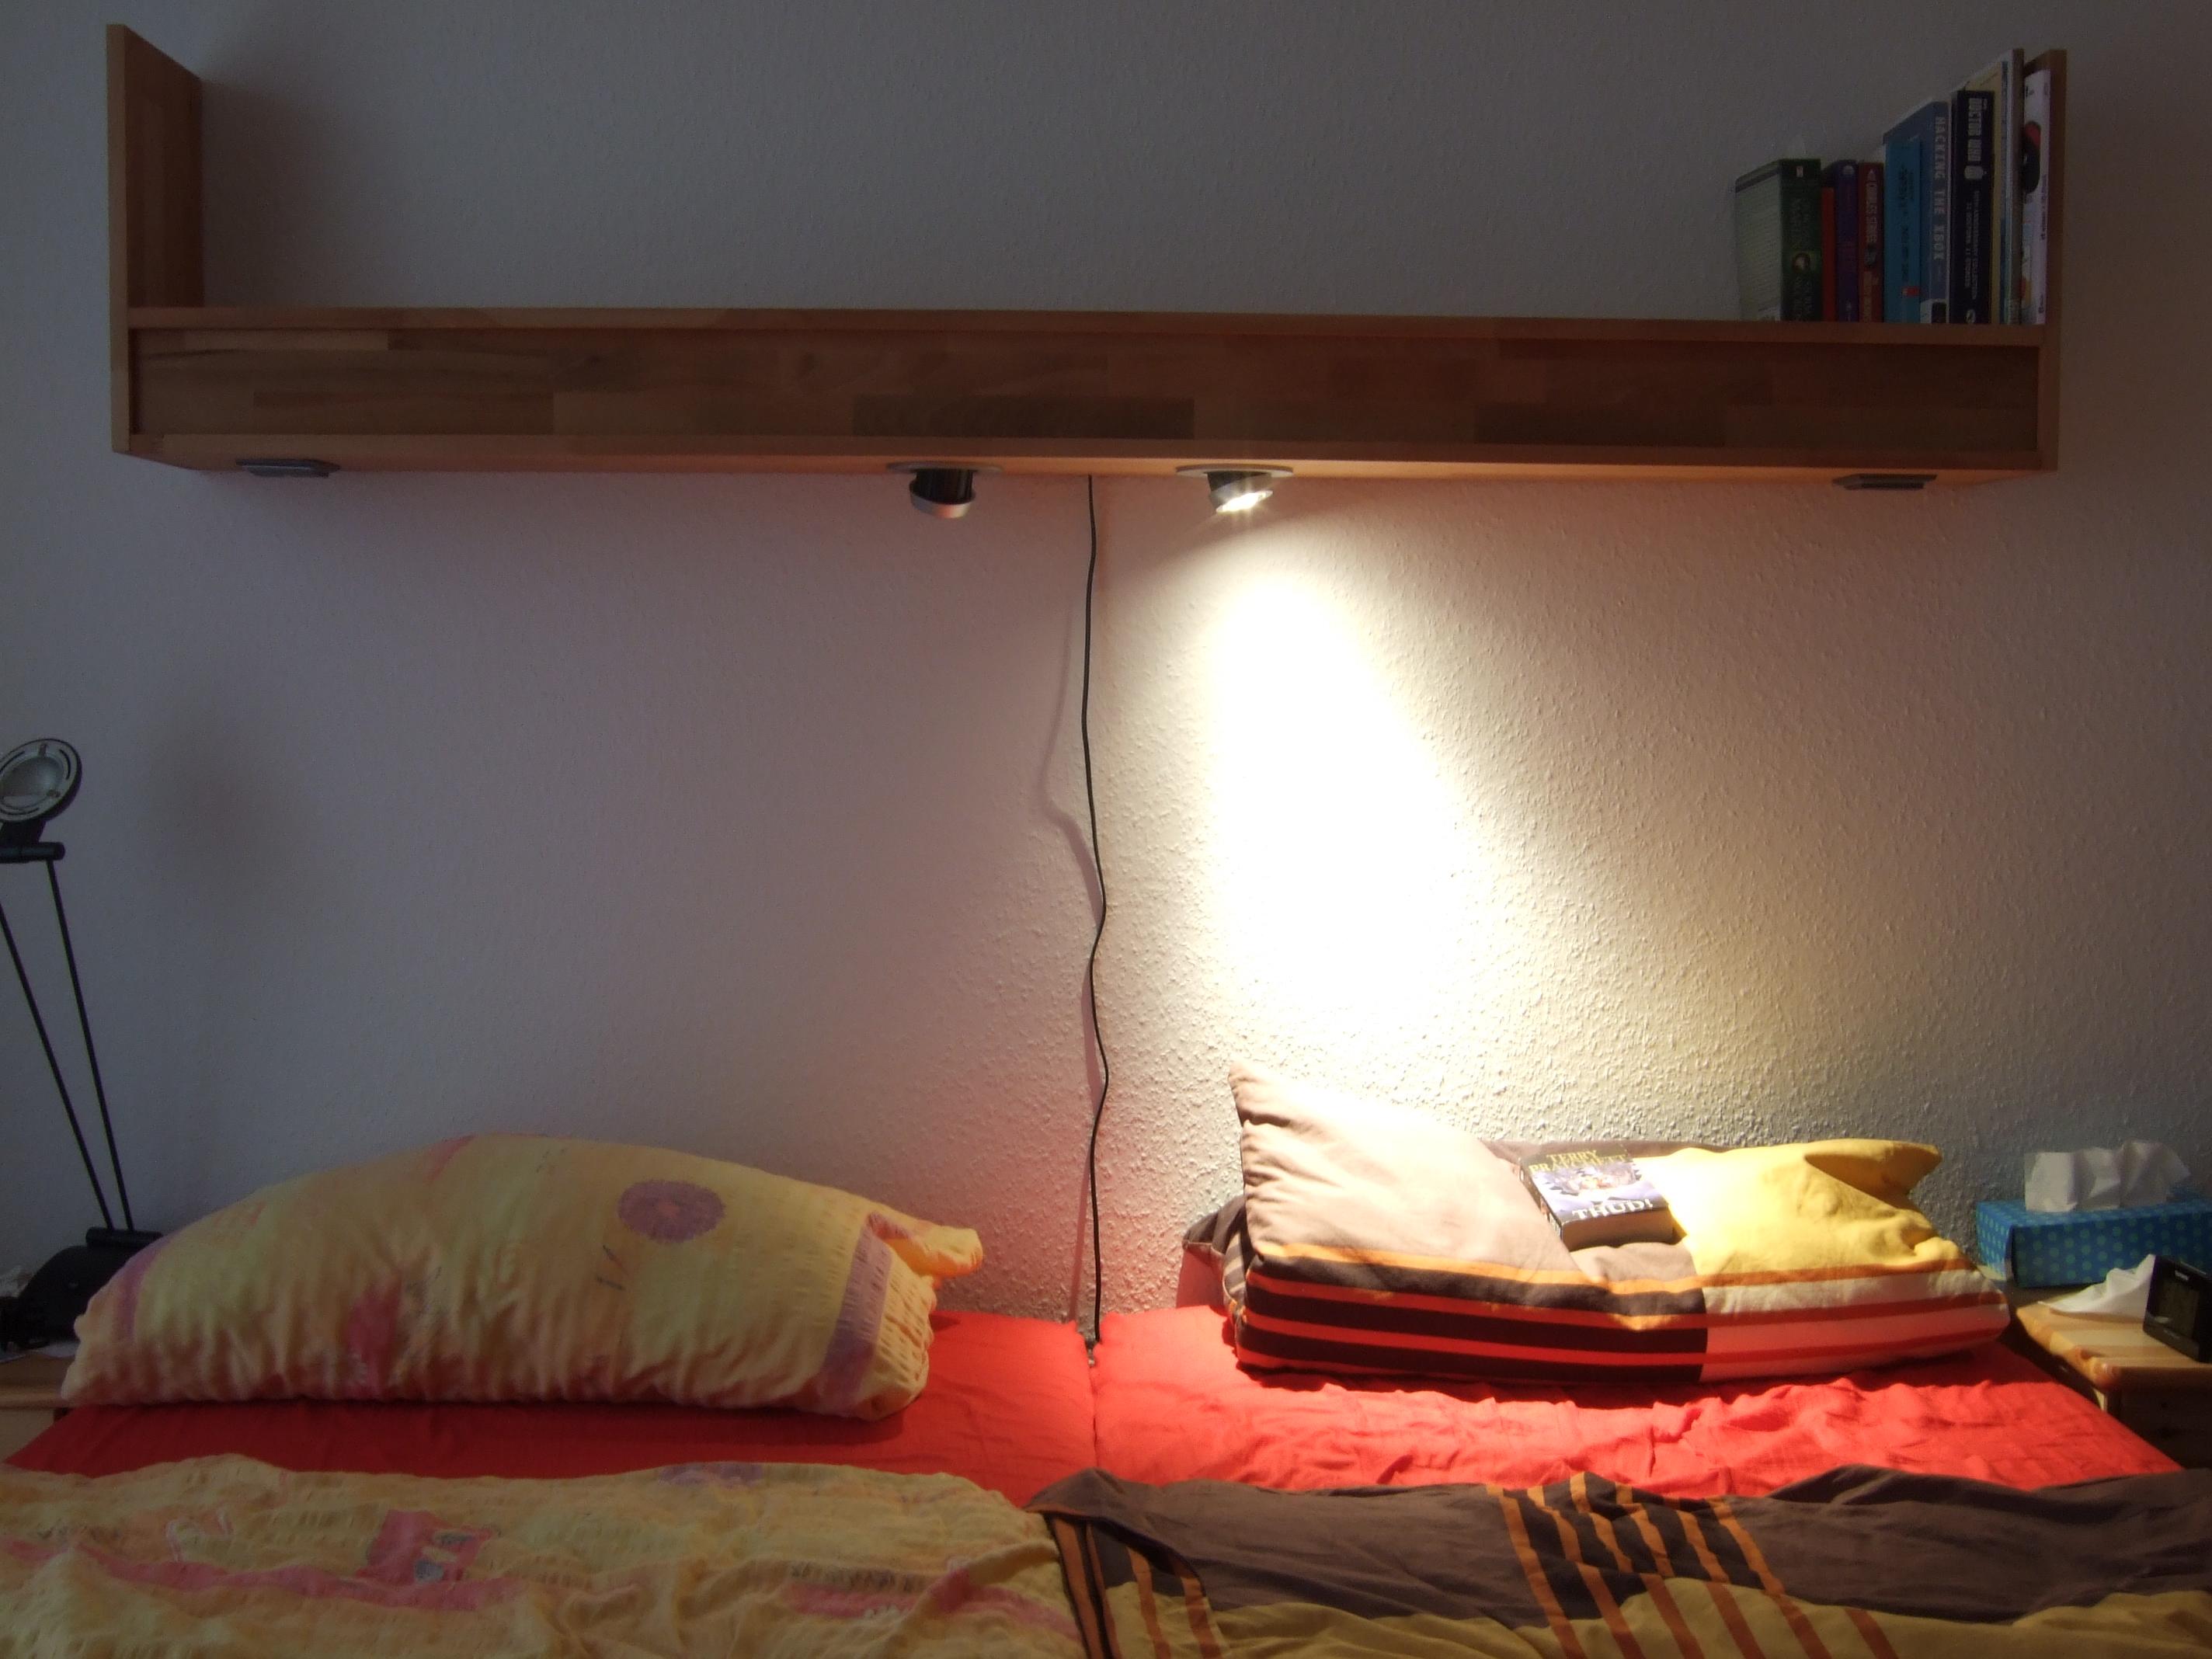 Making a Shelf with Reading Lights · ploek